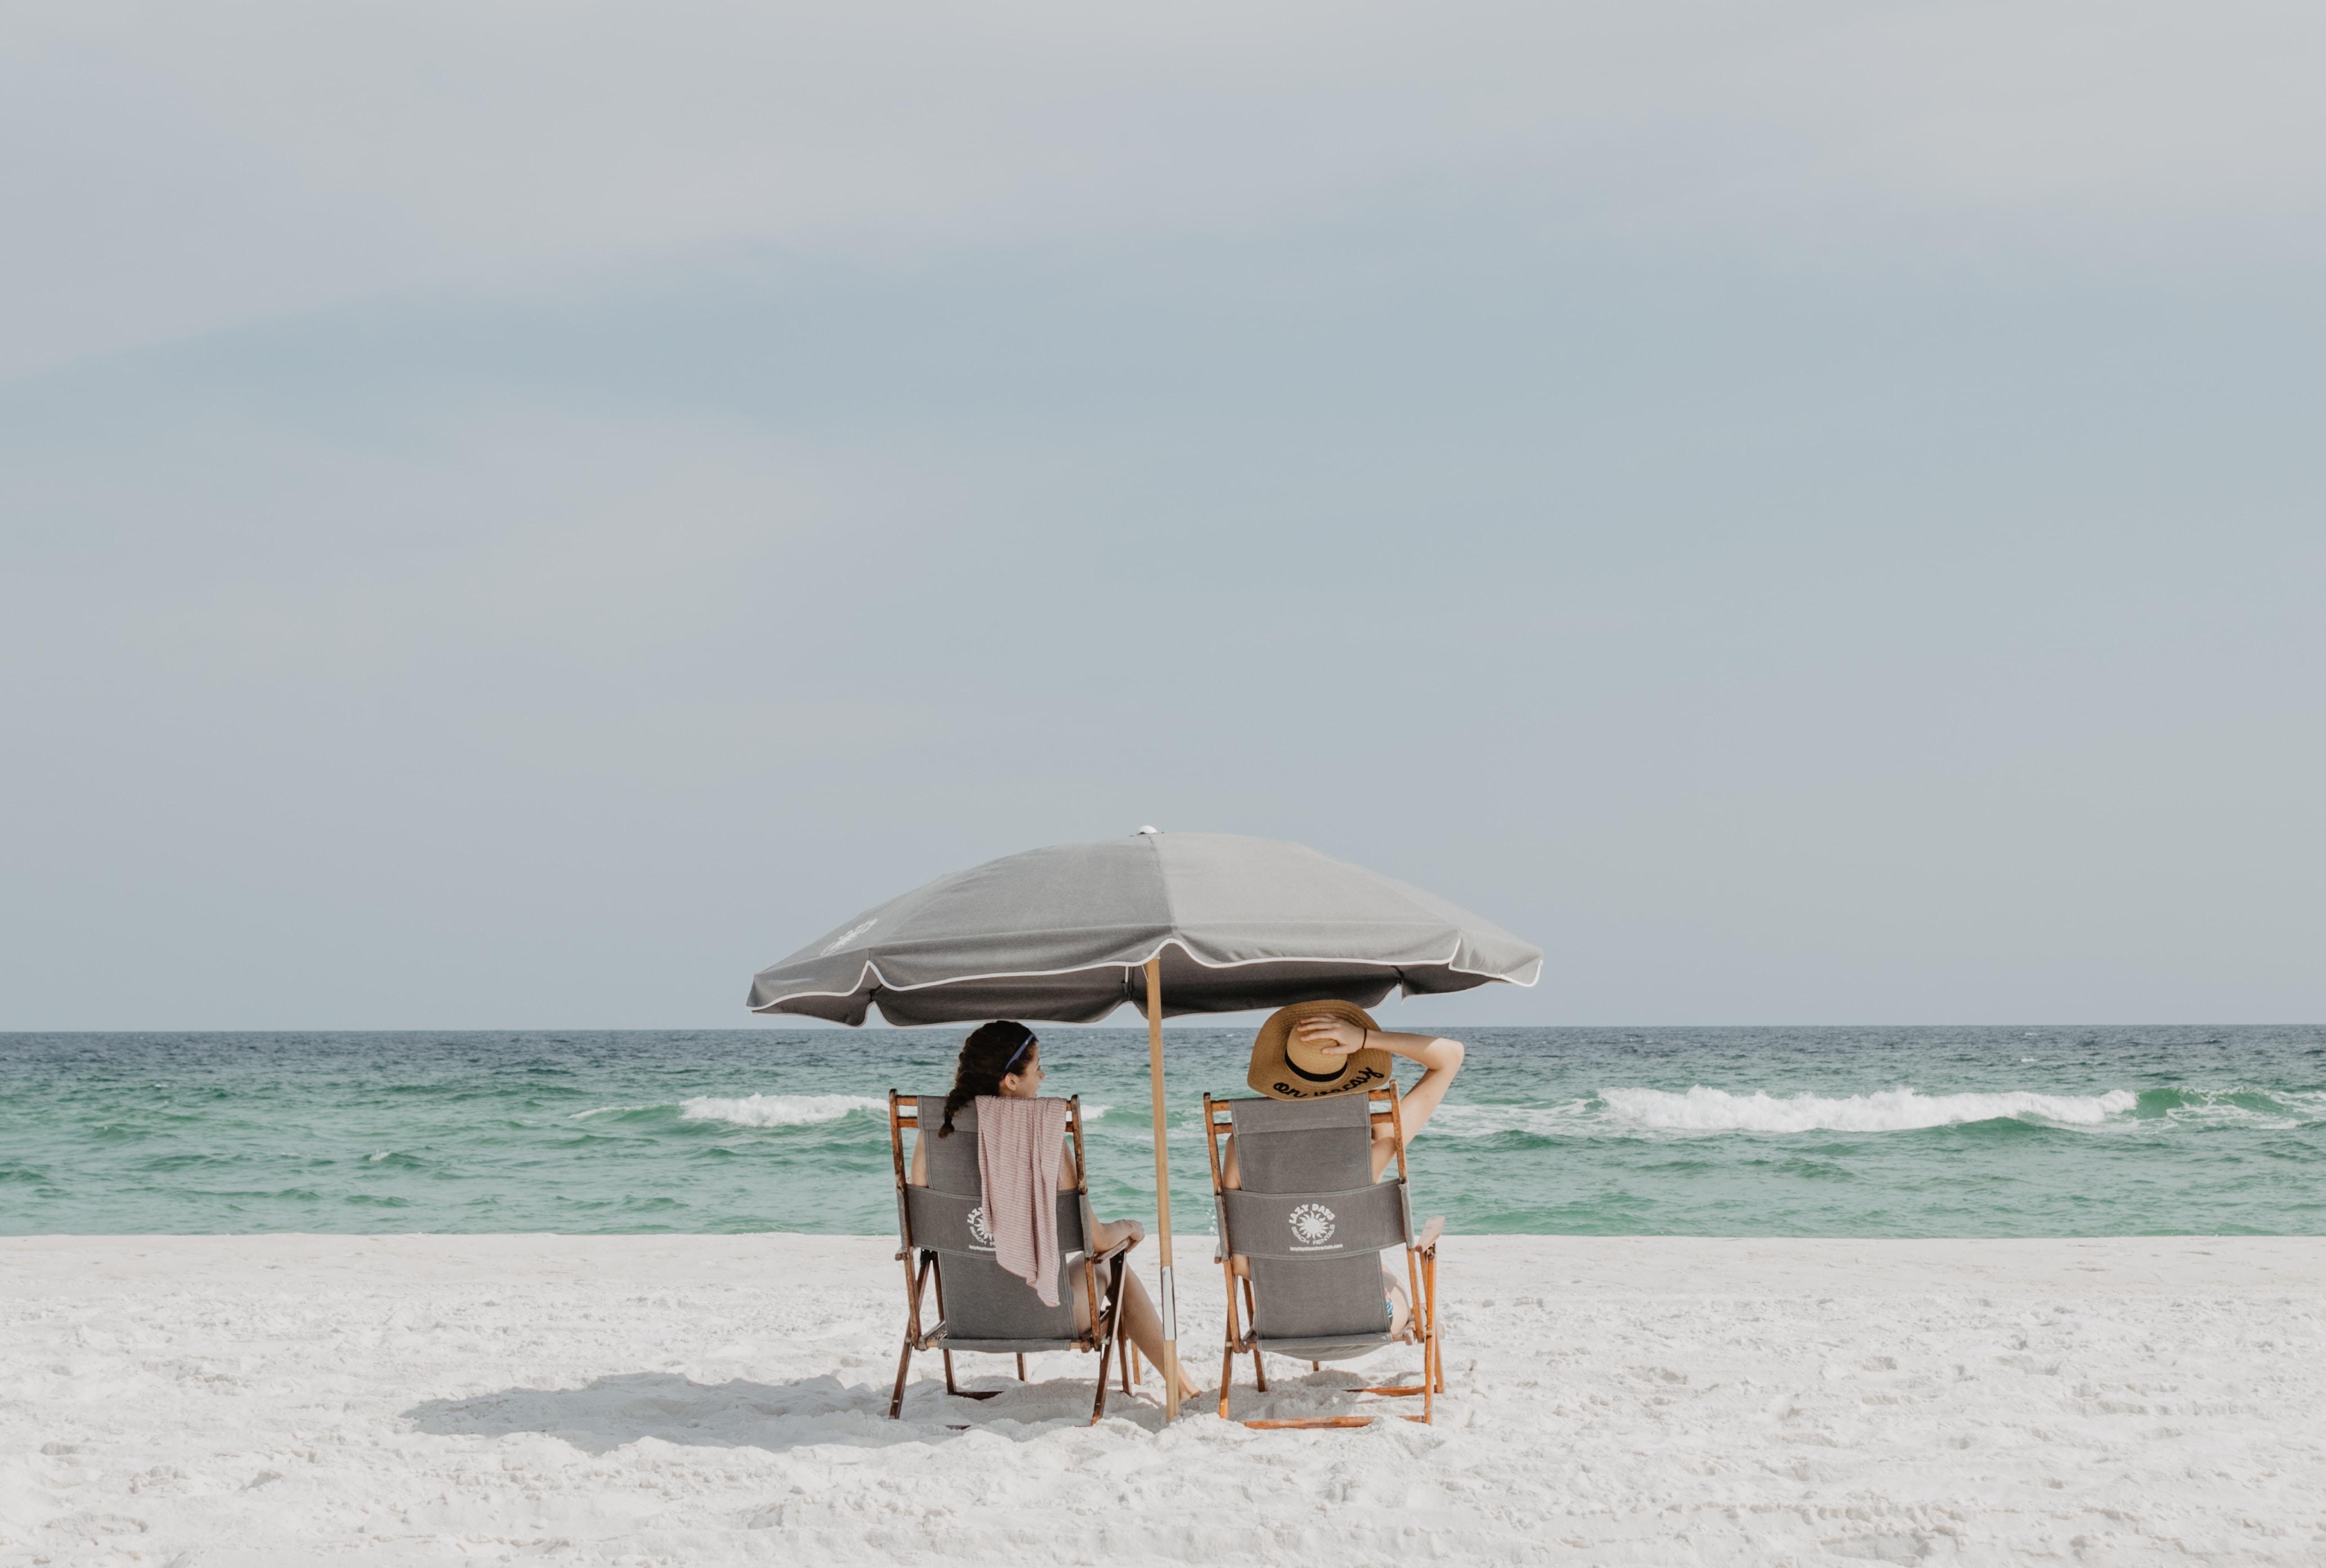 two people under beach umbrella near shoreline